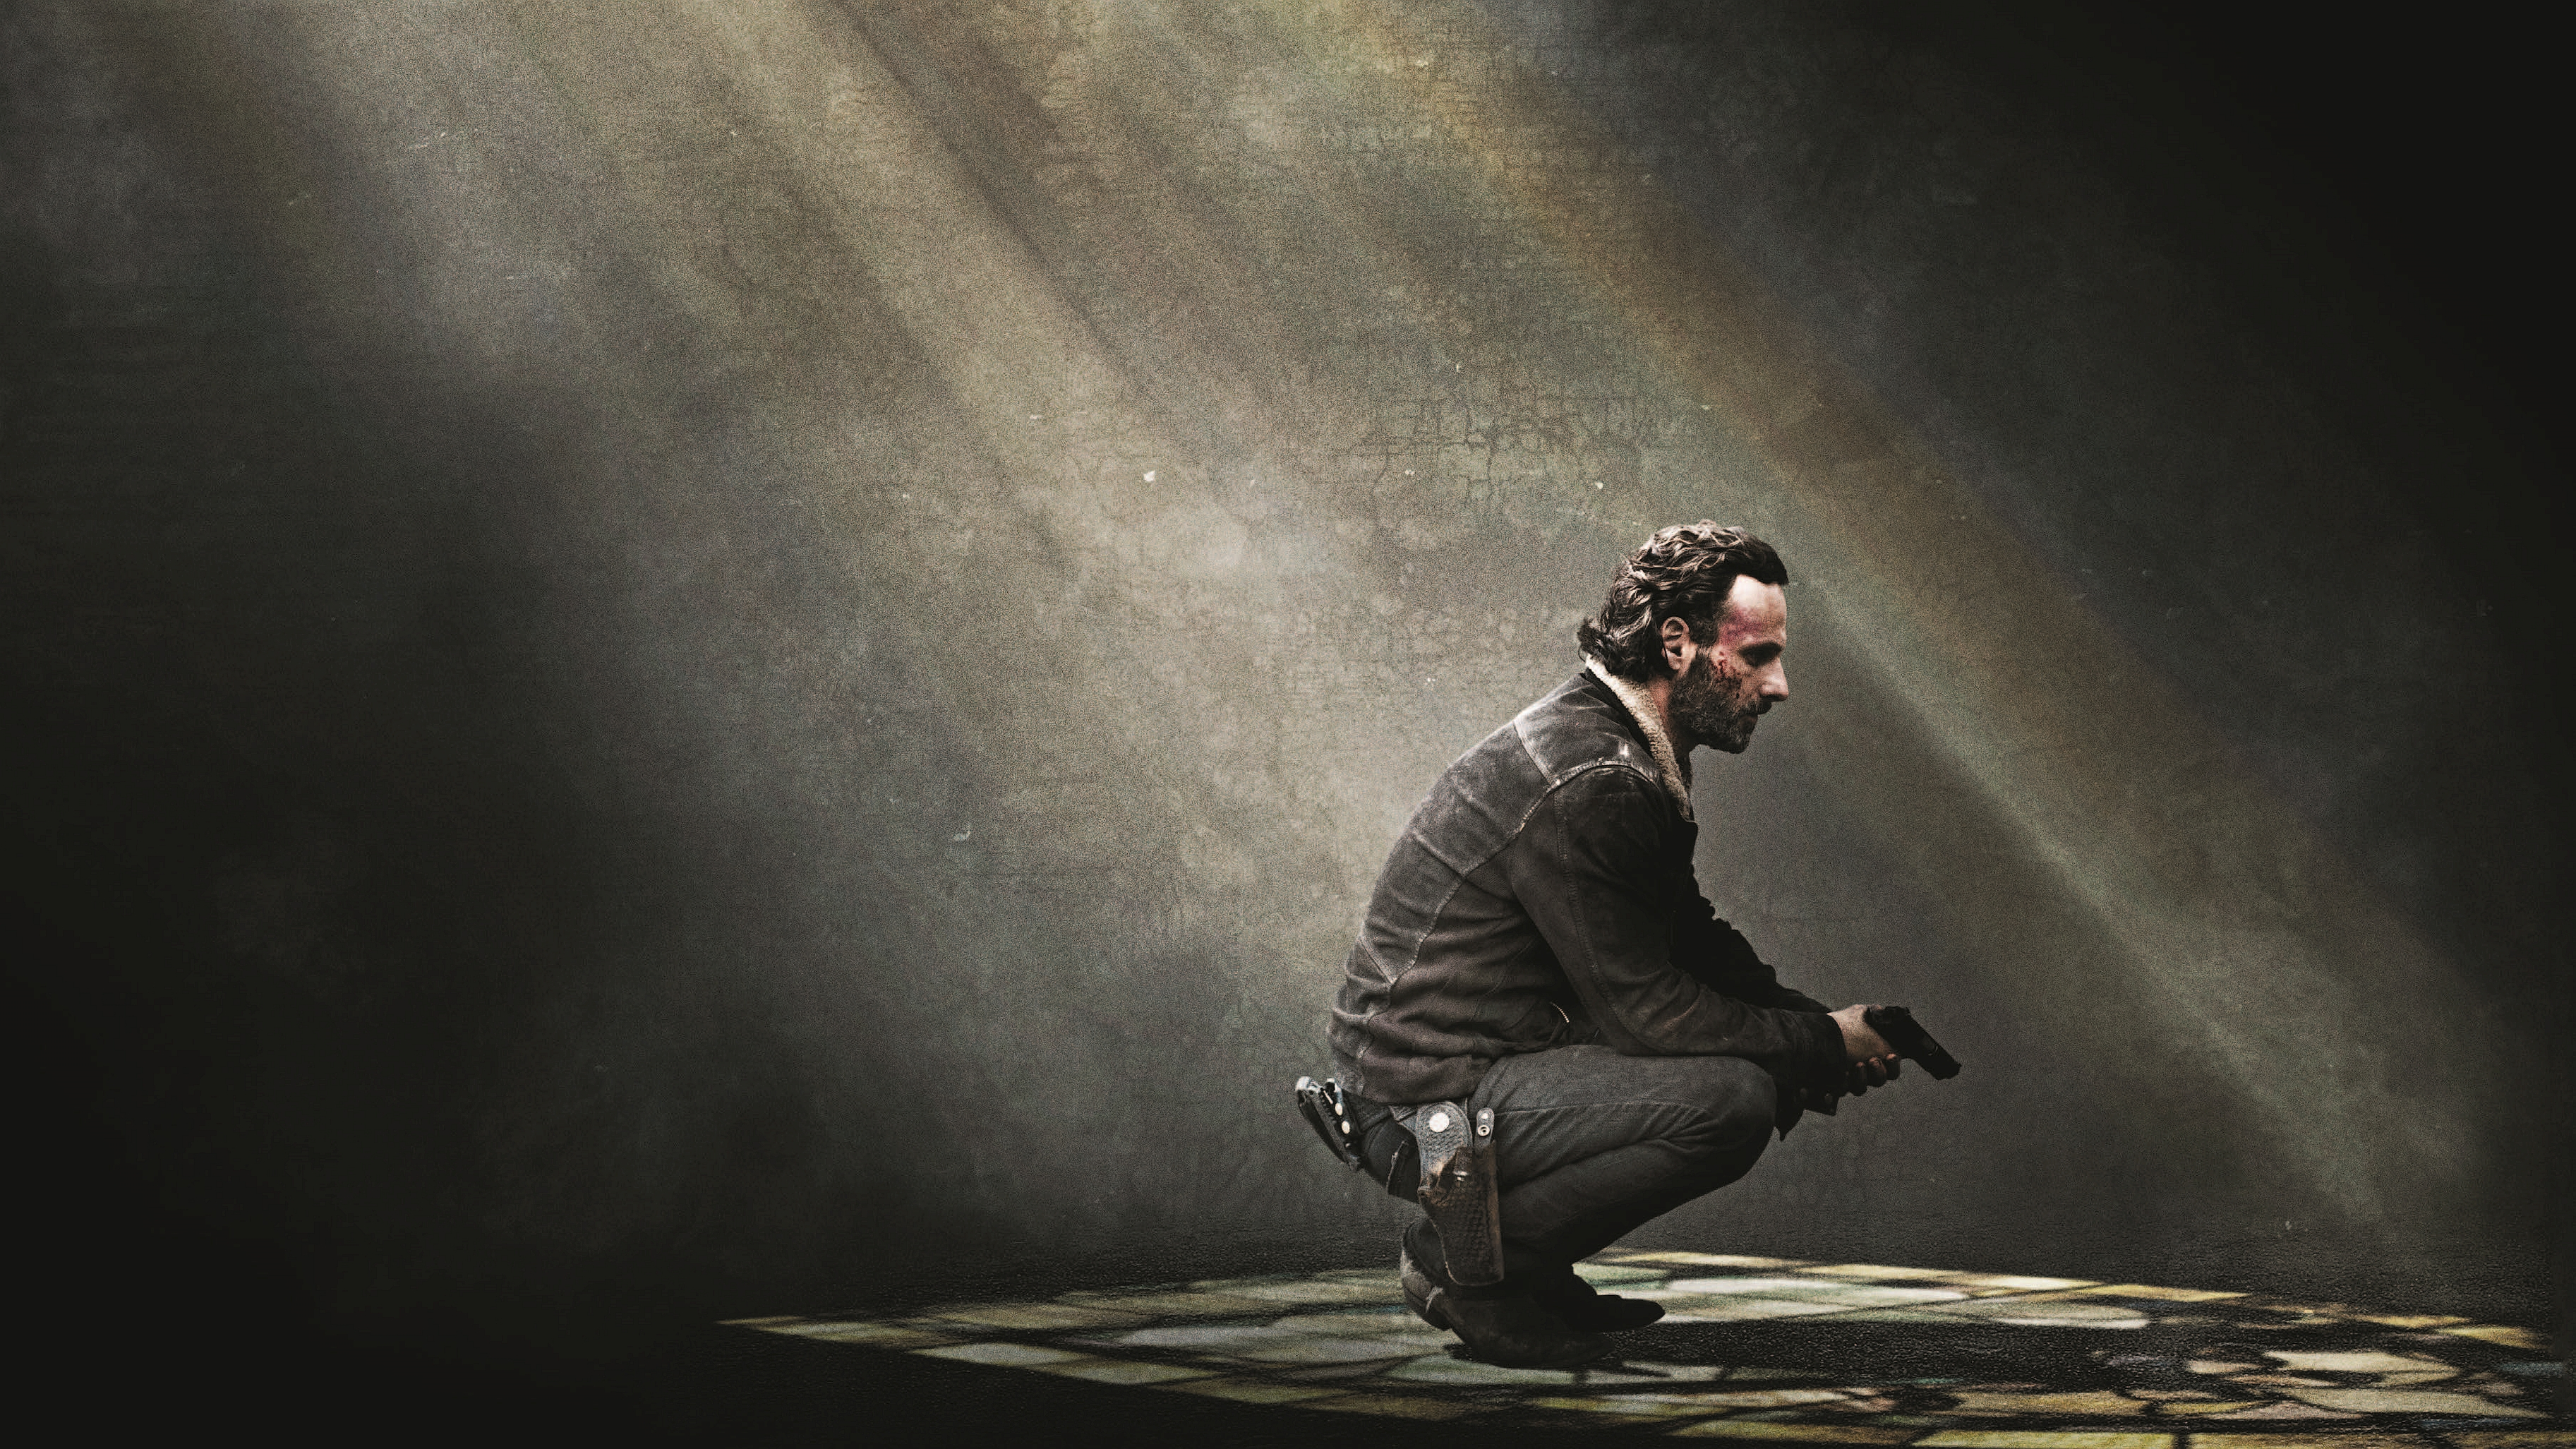 The Walking Dead Hd Wallpaper Background Image 3650x2053 Id